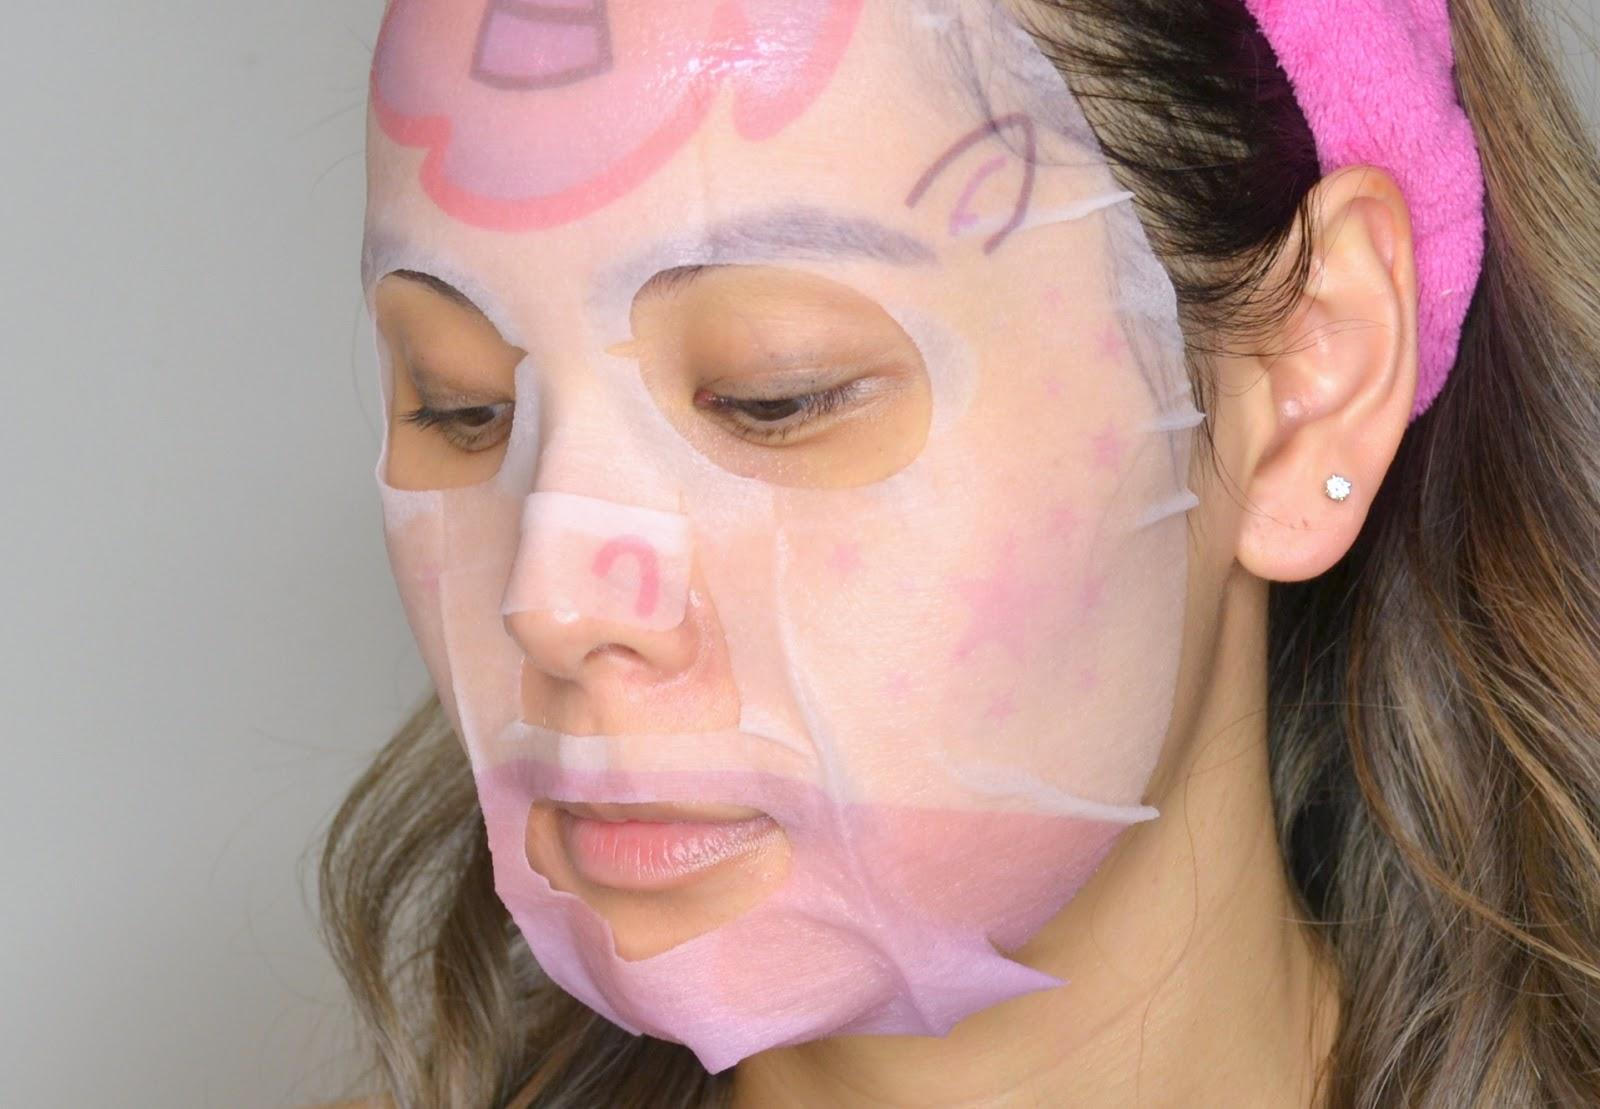 KBEAUTY | The Creme Shop Glow Up Skin Unicorn Face Mask